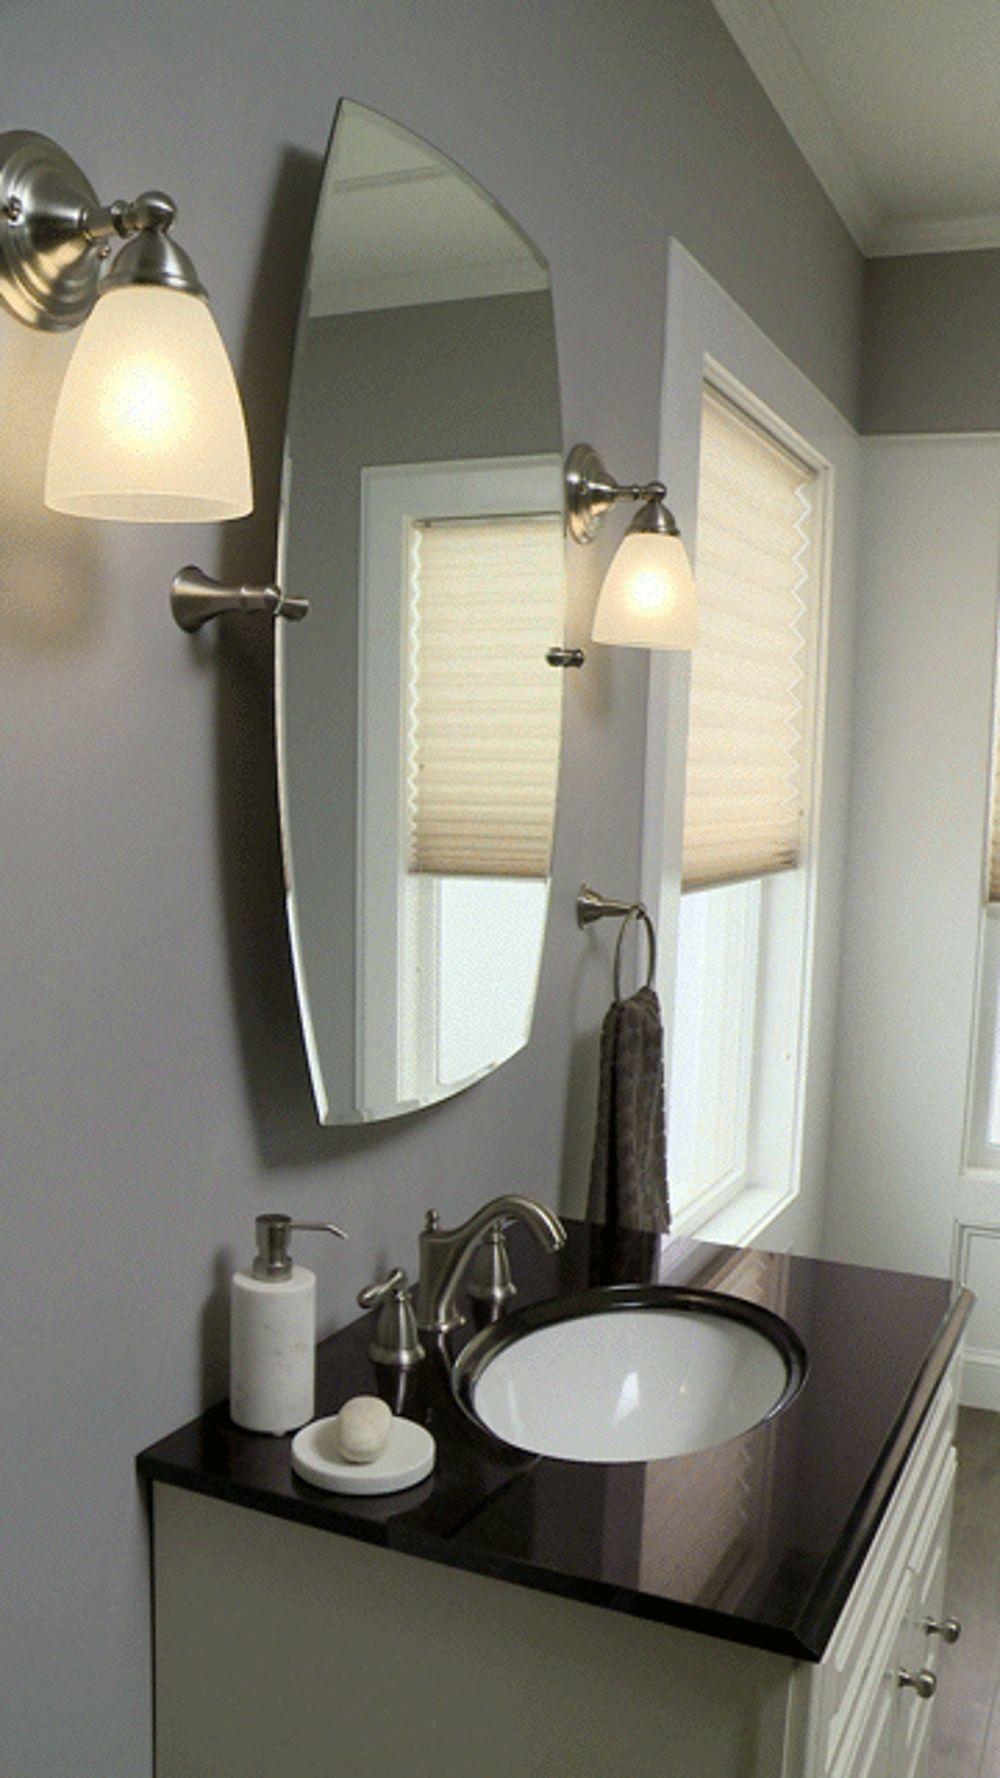 Rockcliff Brushed Nickel Mirror Bh5292bn Moen Brushed Nickel Mirror Diy Vanity Mirror Bathroom Mirror